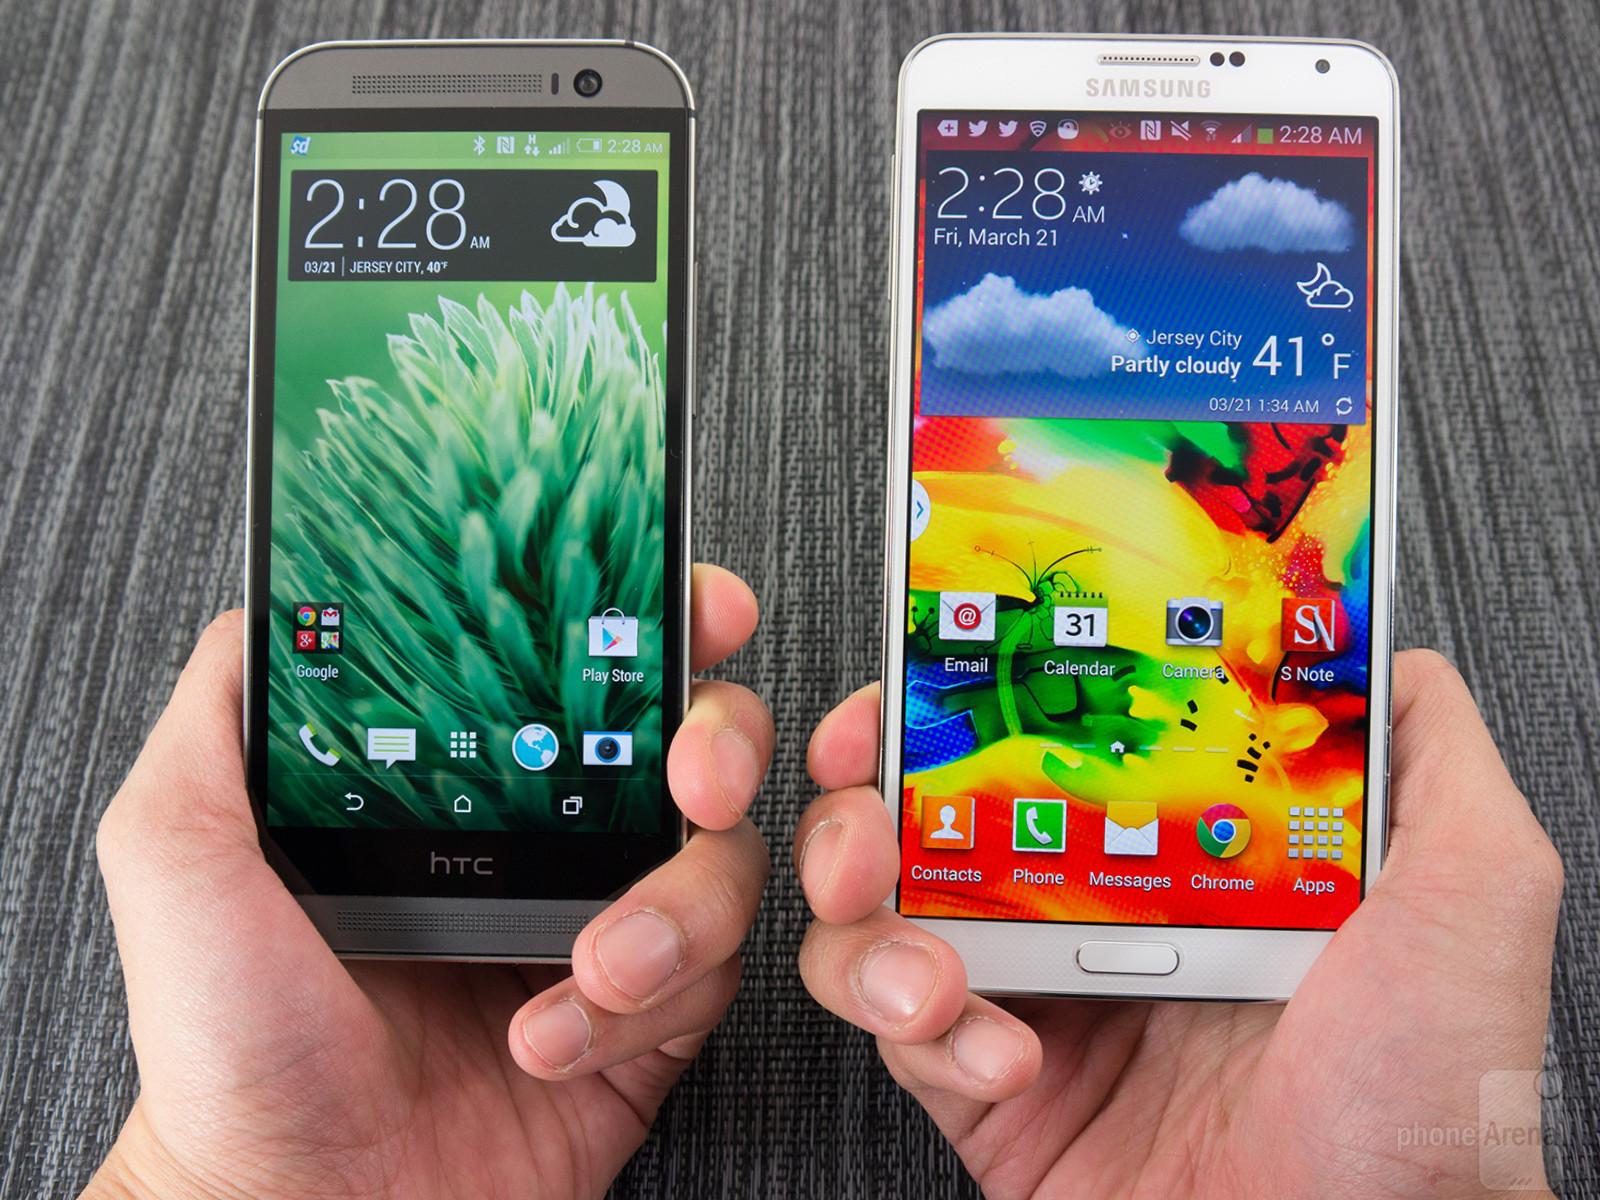 Galaxy Note 3 Neo vs Htc One